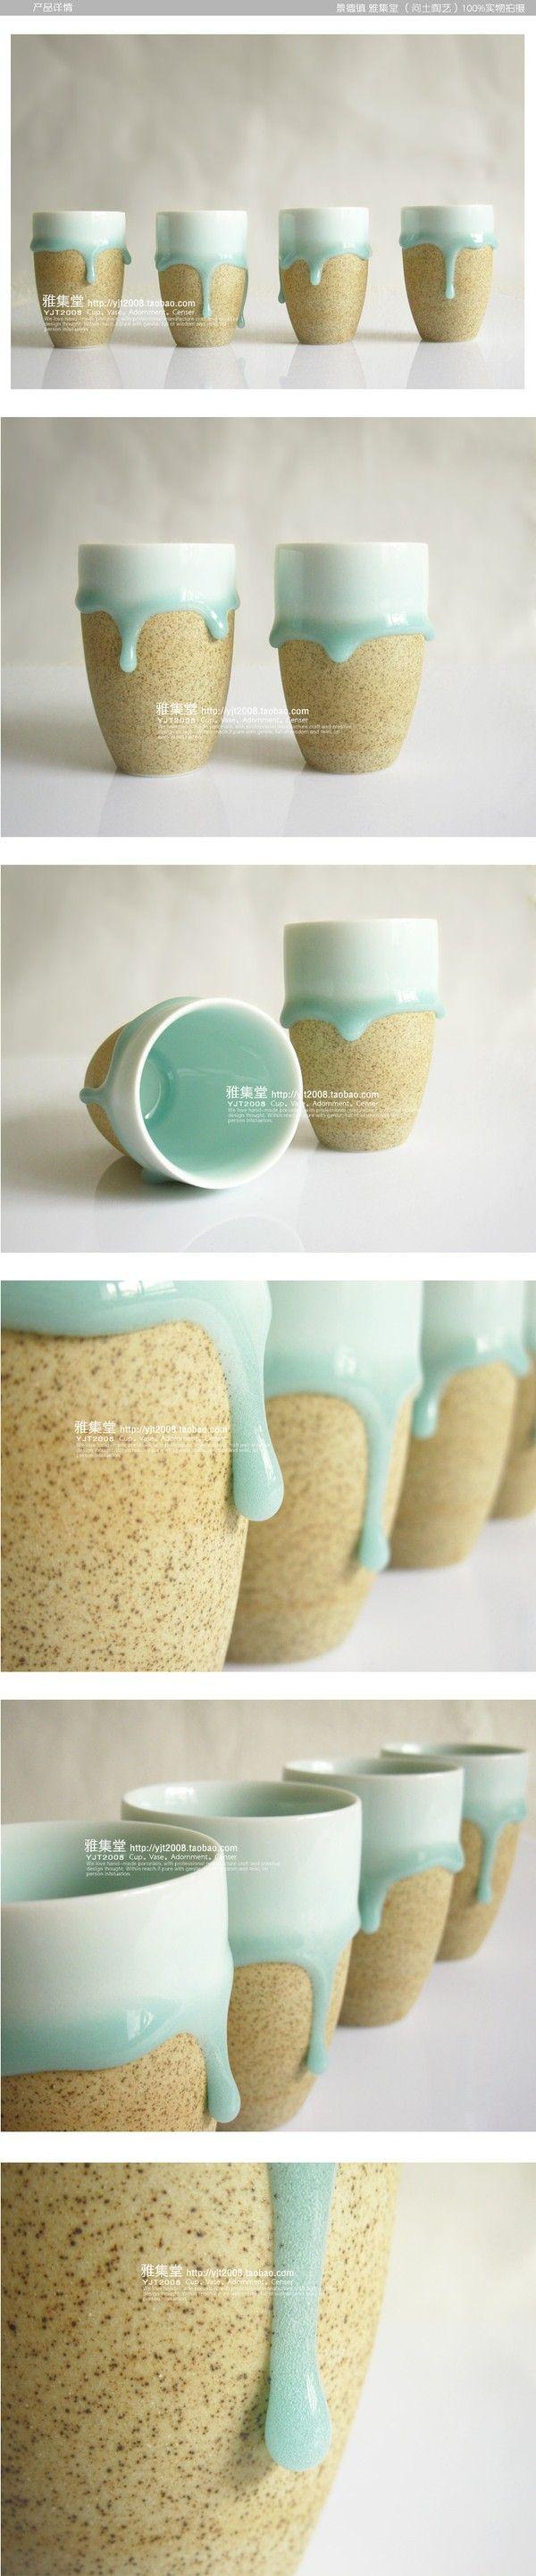 I adore these mugs! Beautiful.